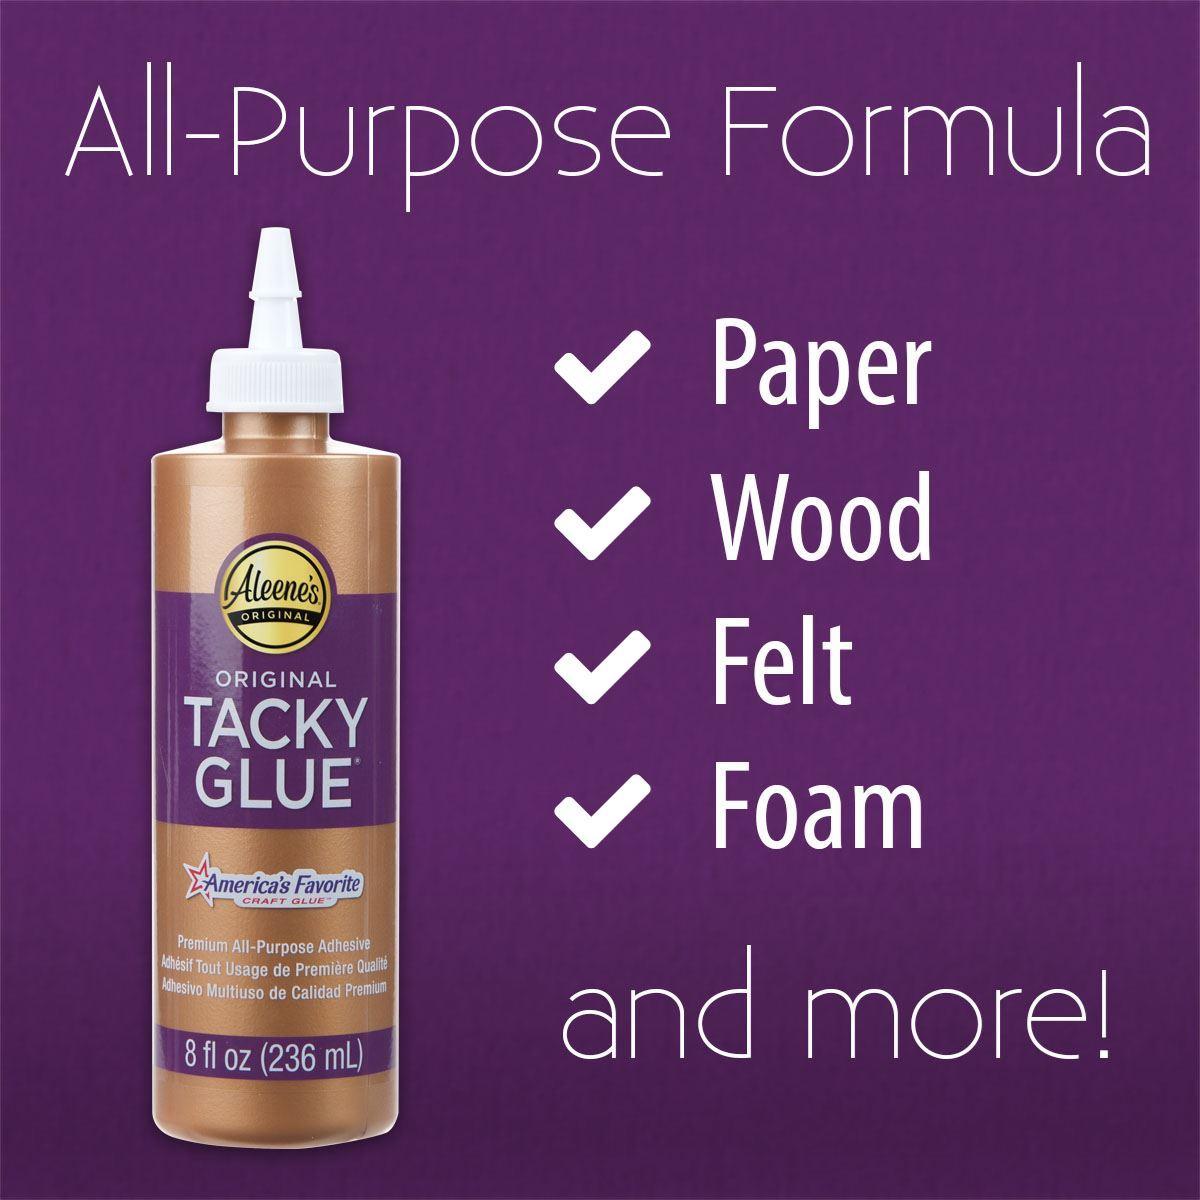 Aleene's® Original Tacky Glue - surfaces